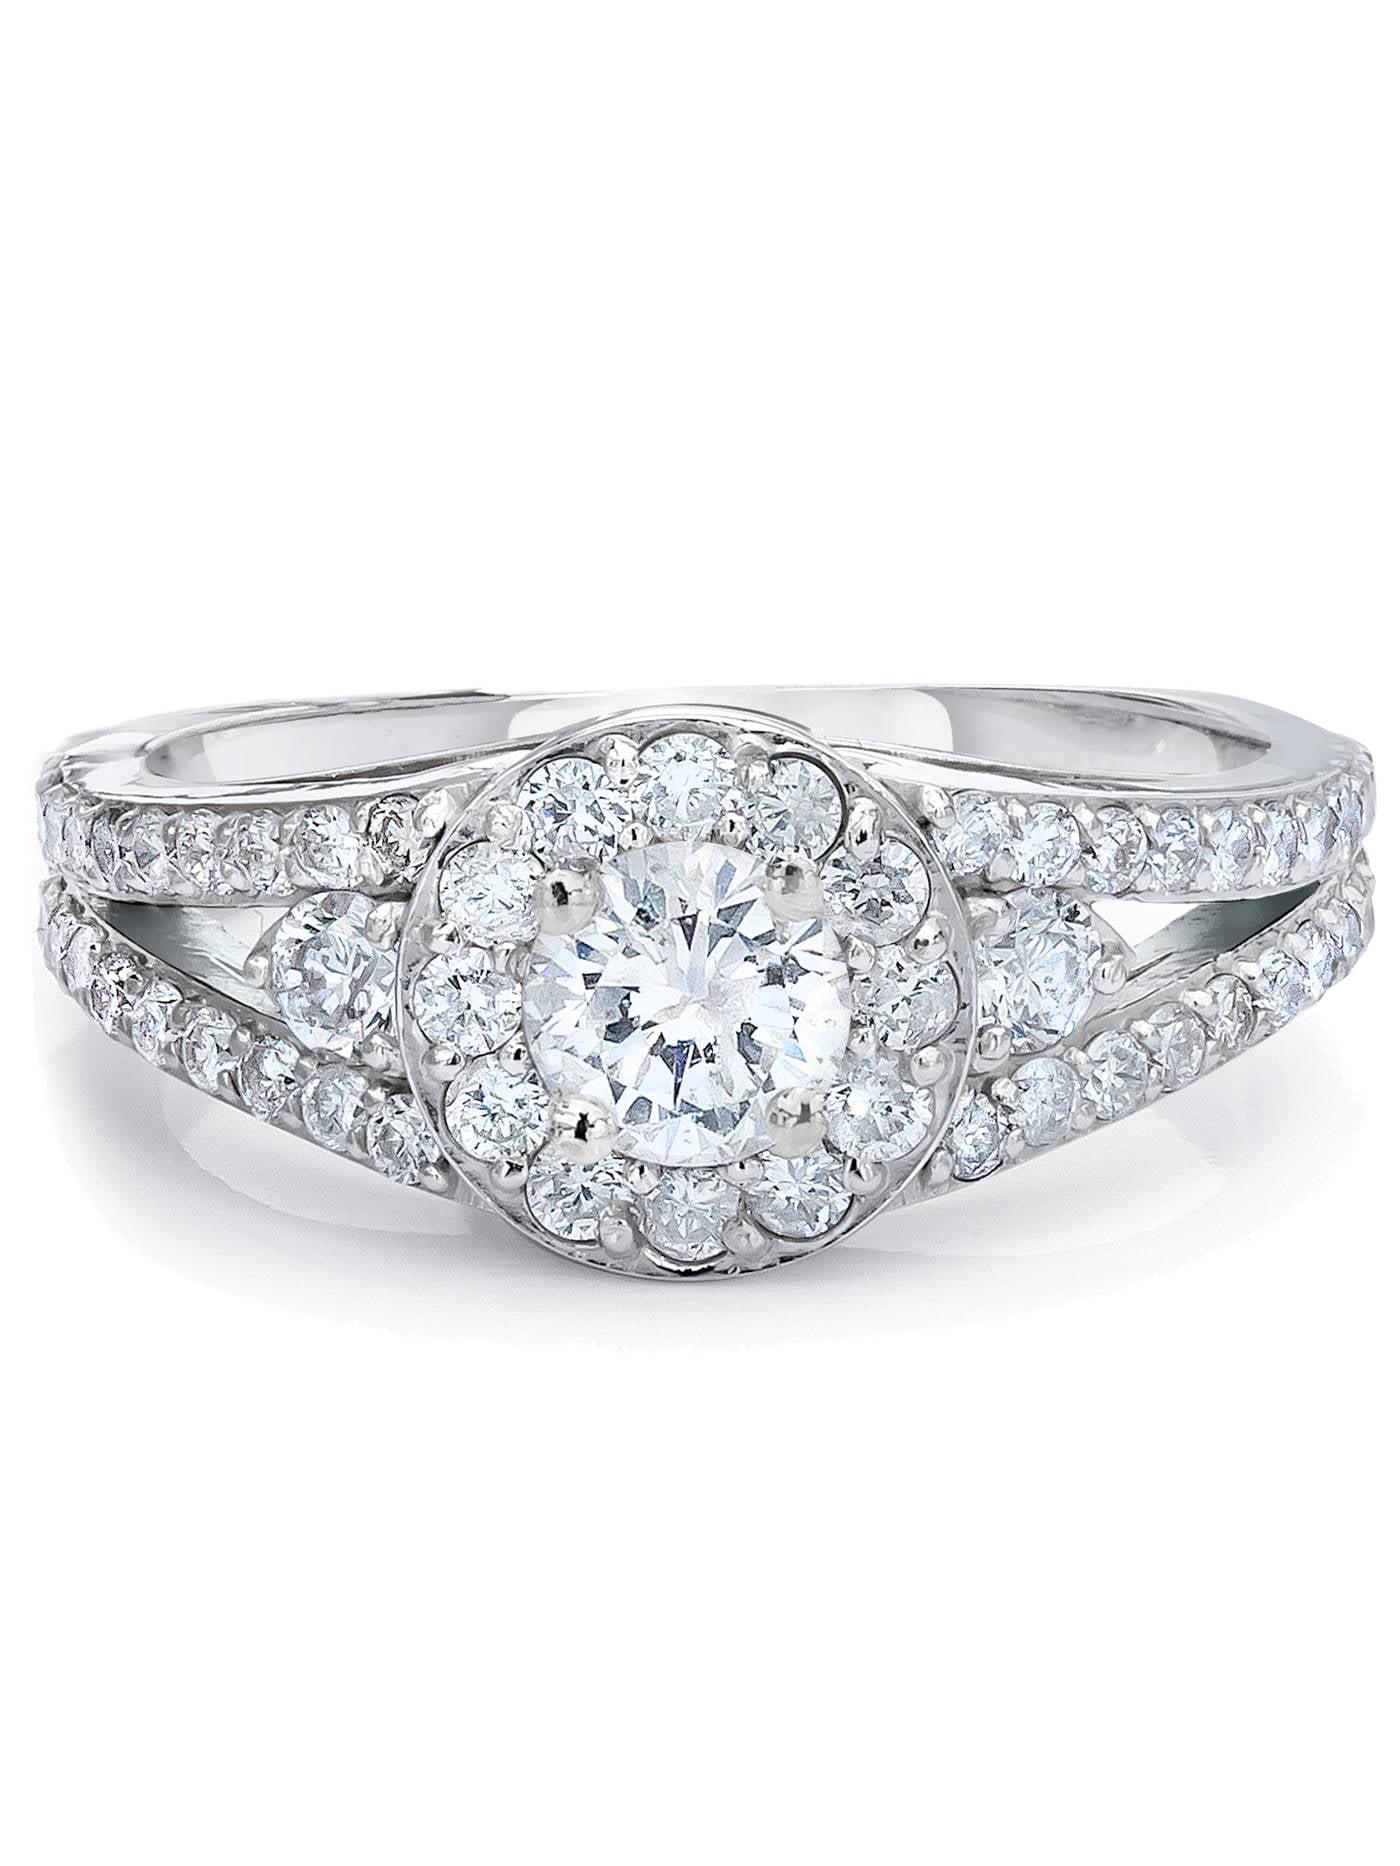 3 4ct Halo Diamond Engagement Ring 14K White gold Vintage Split Shank by Pompeii3